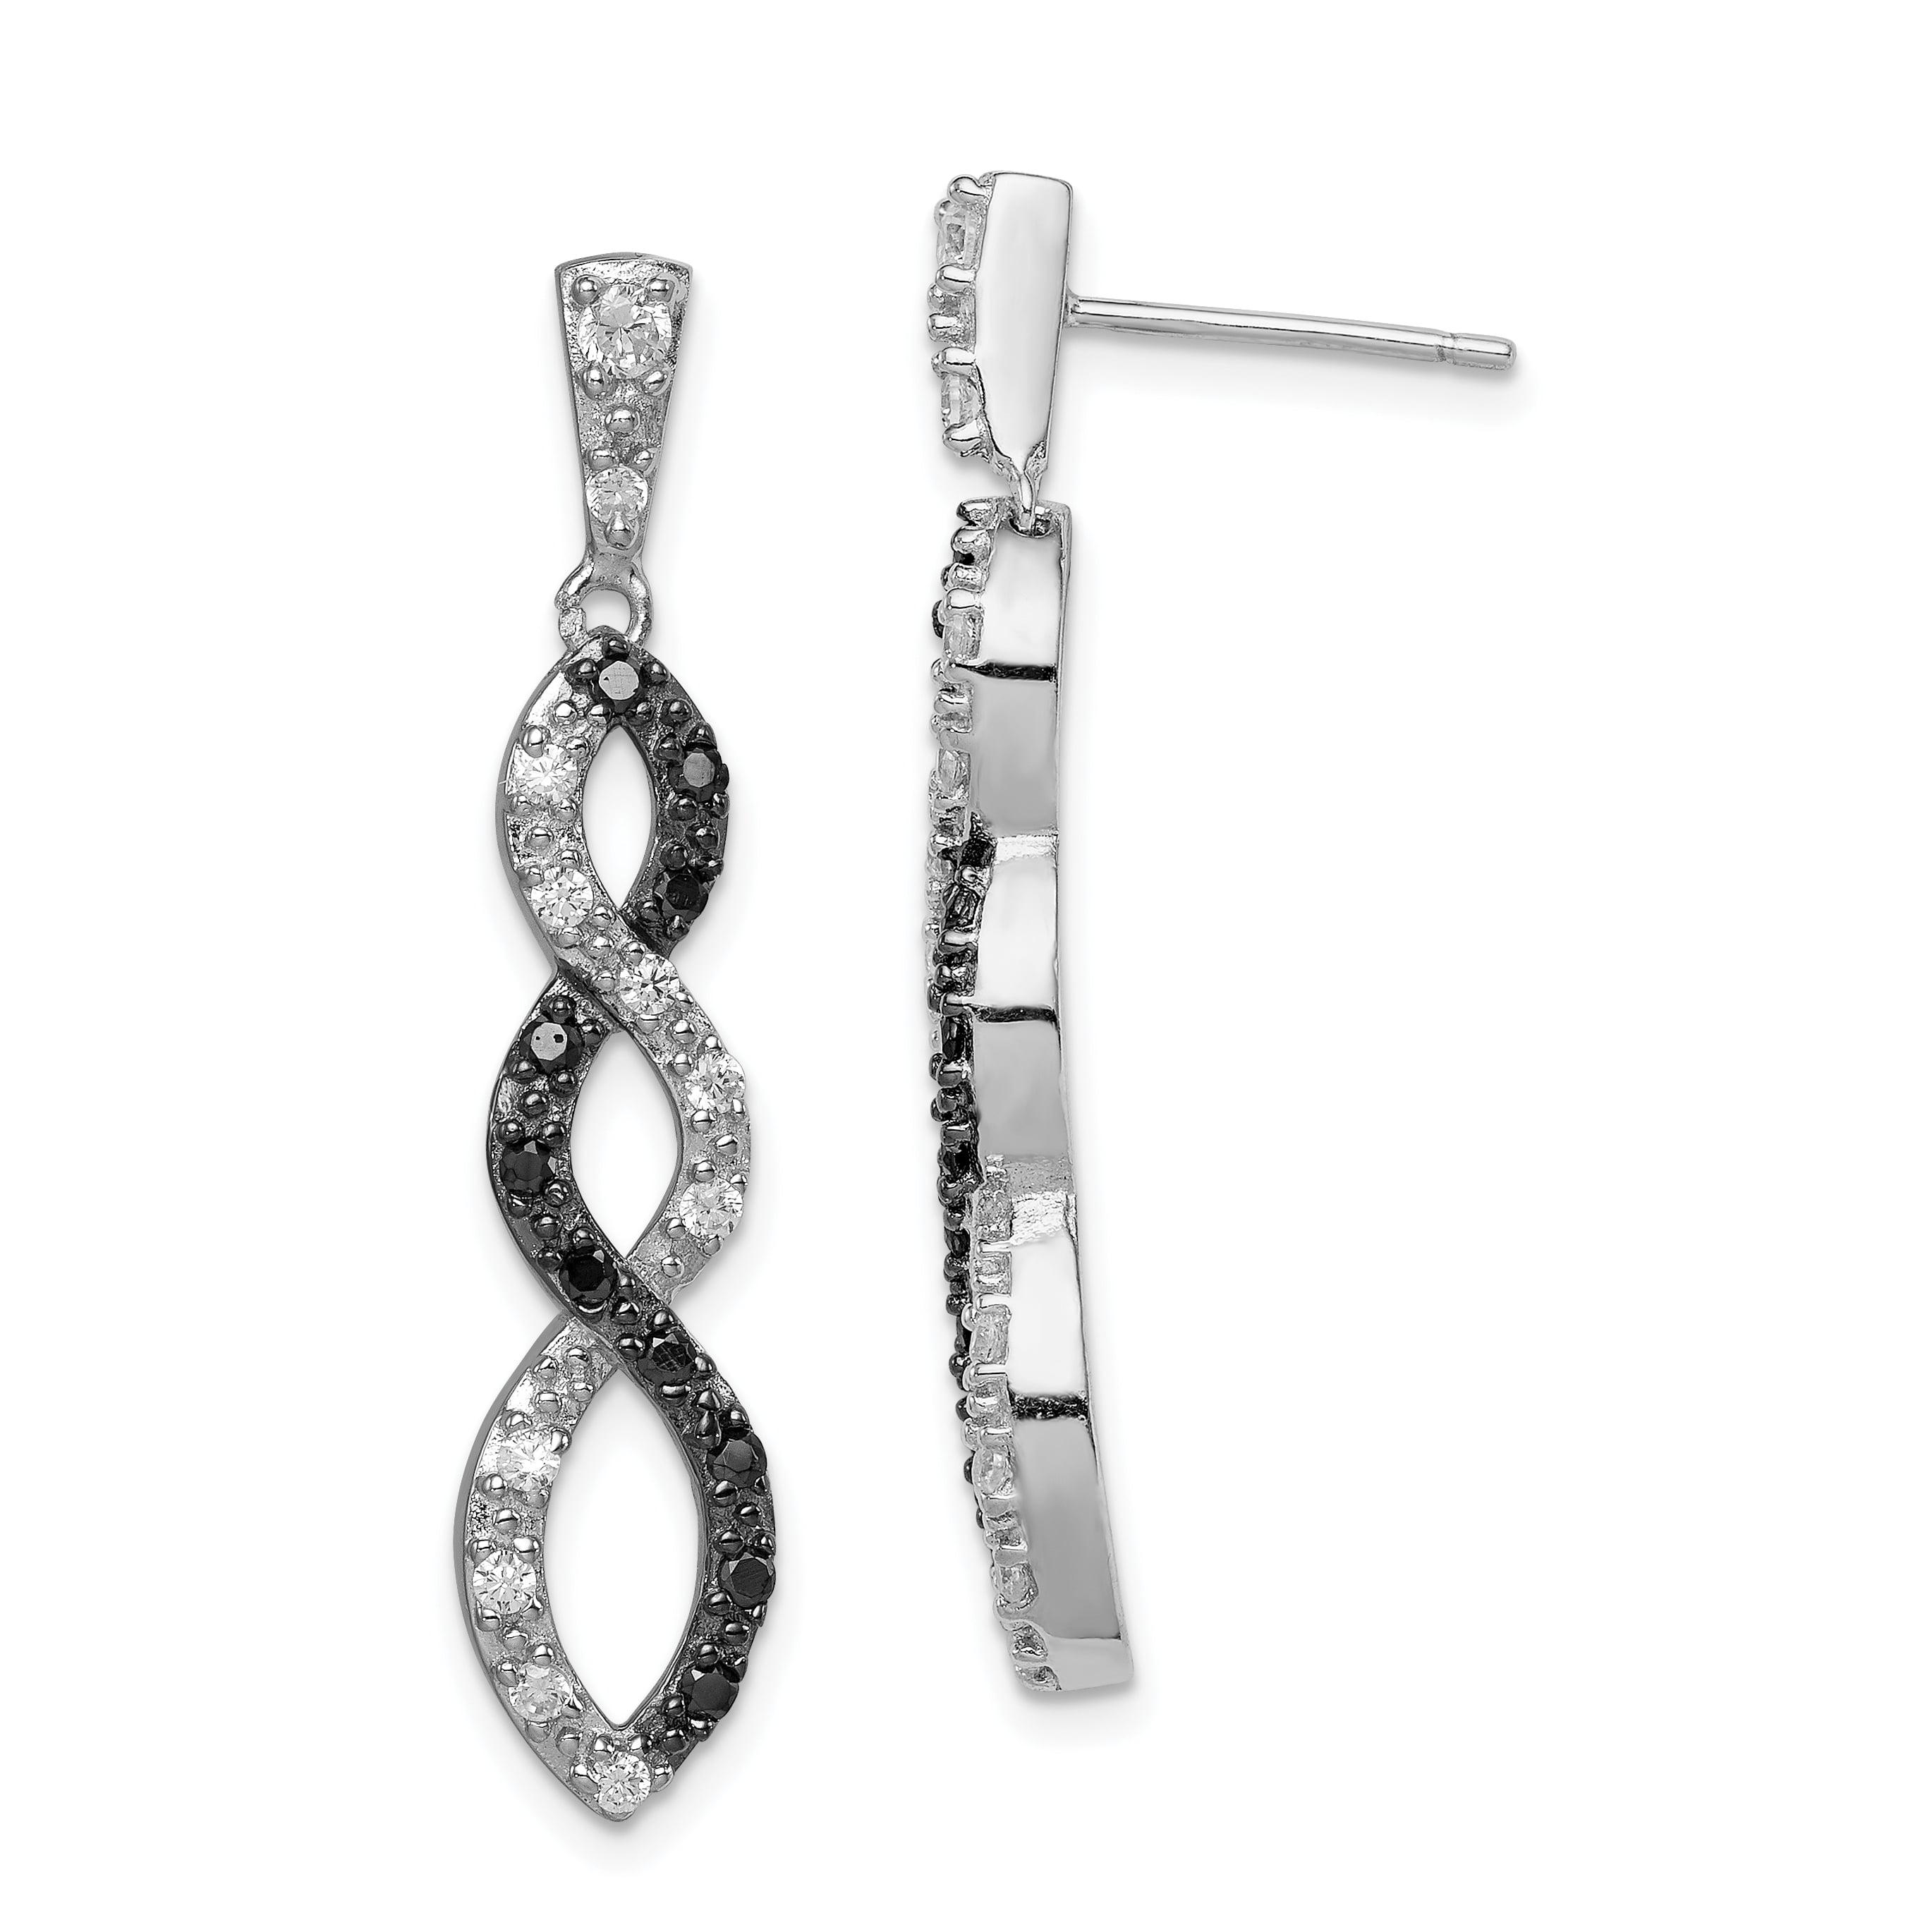 16mm x 10mm Mia Diamonds 925 Sterling Silver Diamond and Opal Pendant